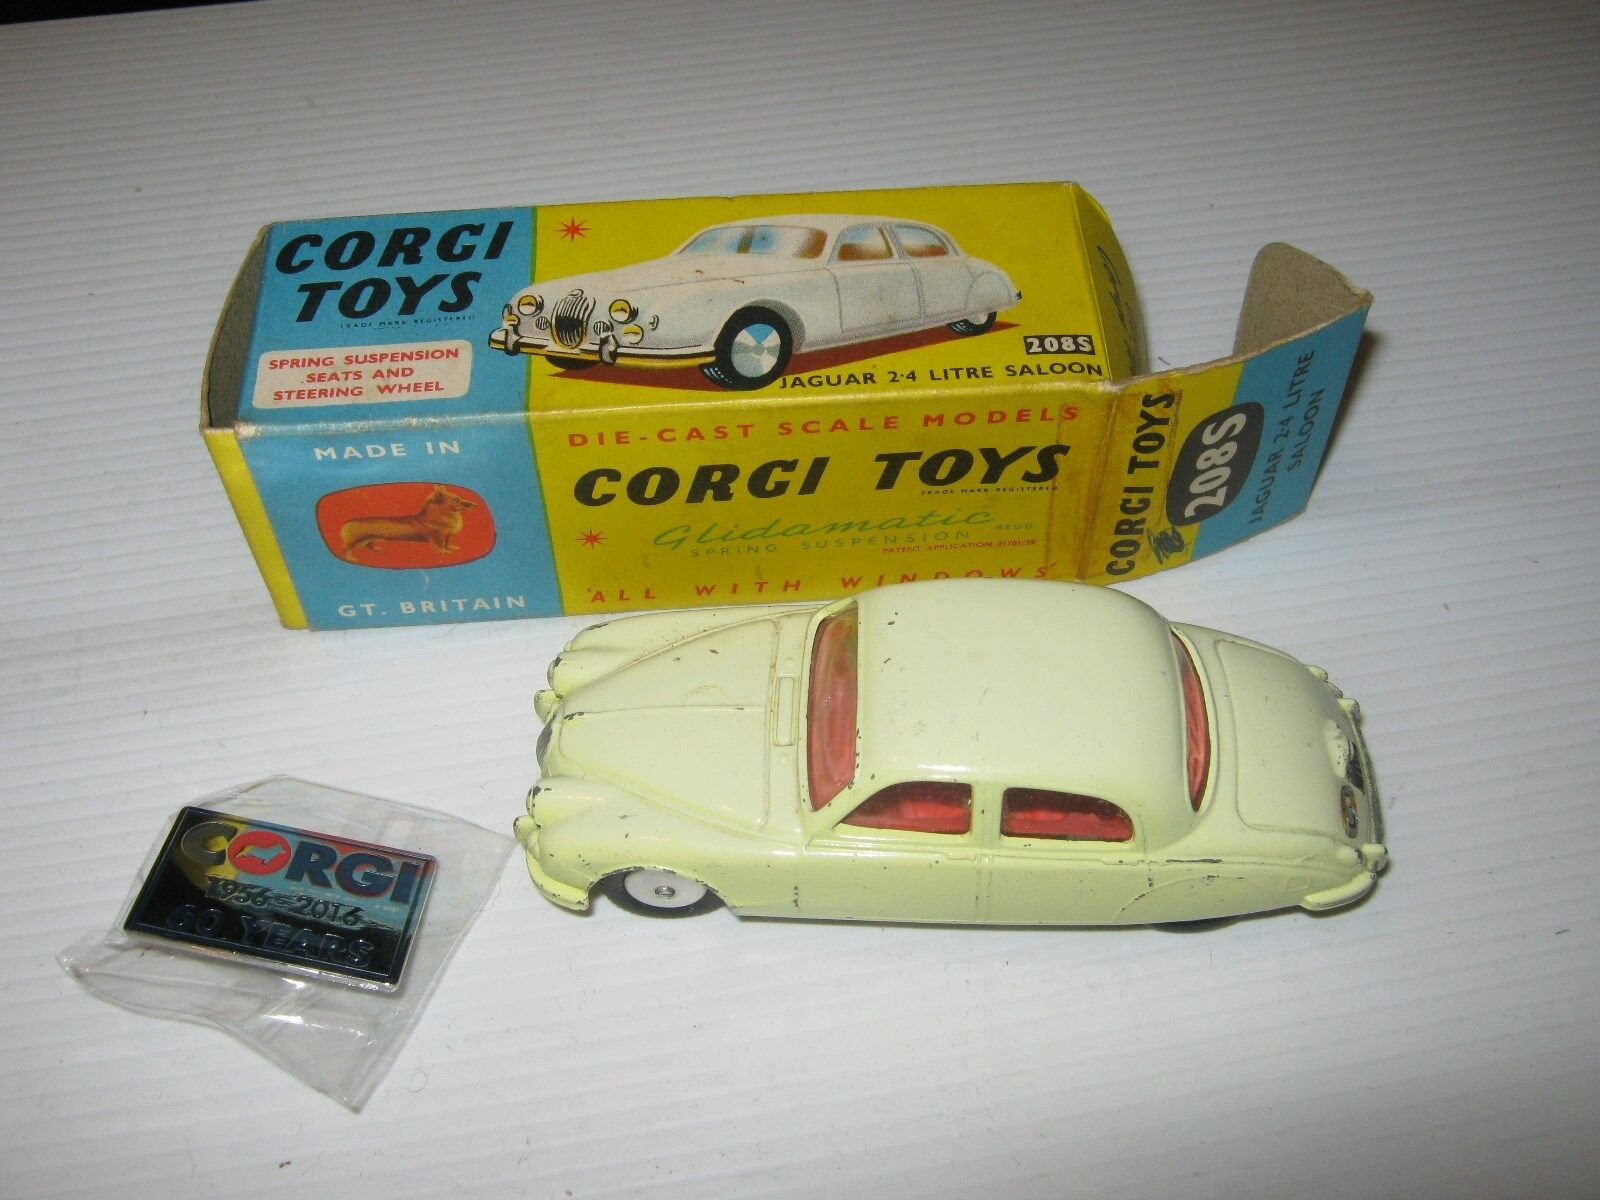 CORGI 208S JAGUAR 2.4 ORIGINAL LIGHT MARKS IN IN IN BOX VERY GOOD ORIGINAL AS SHOWN 5bbee3